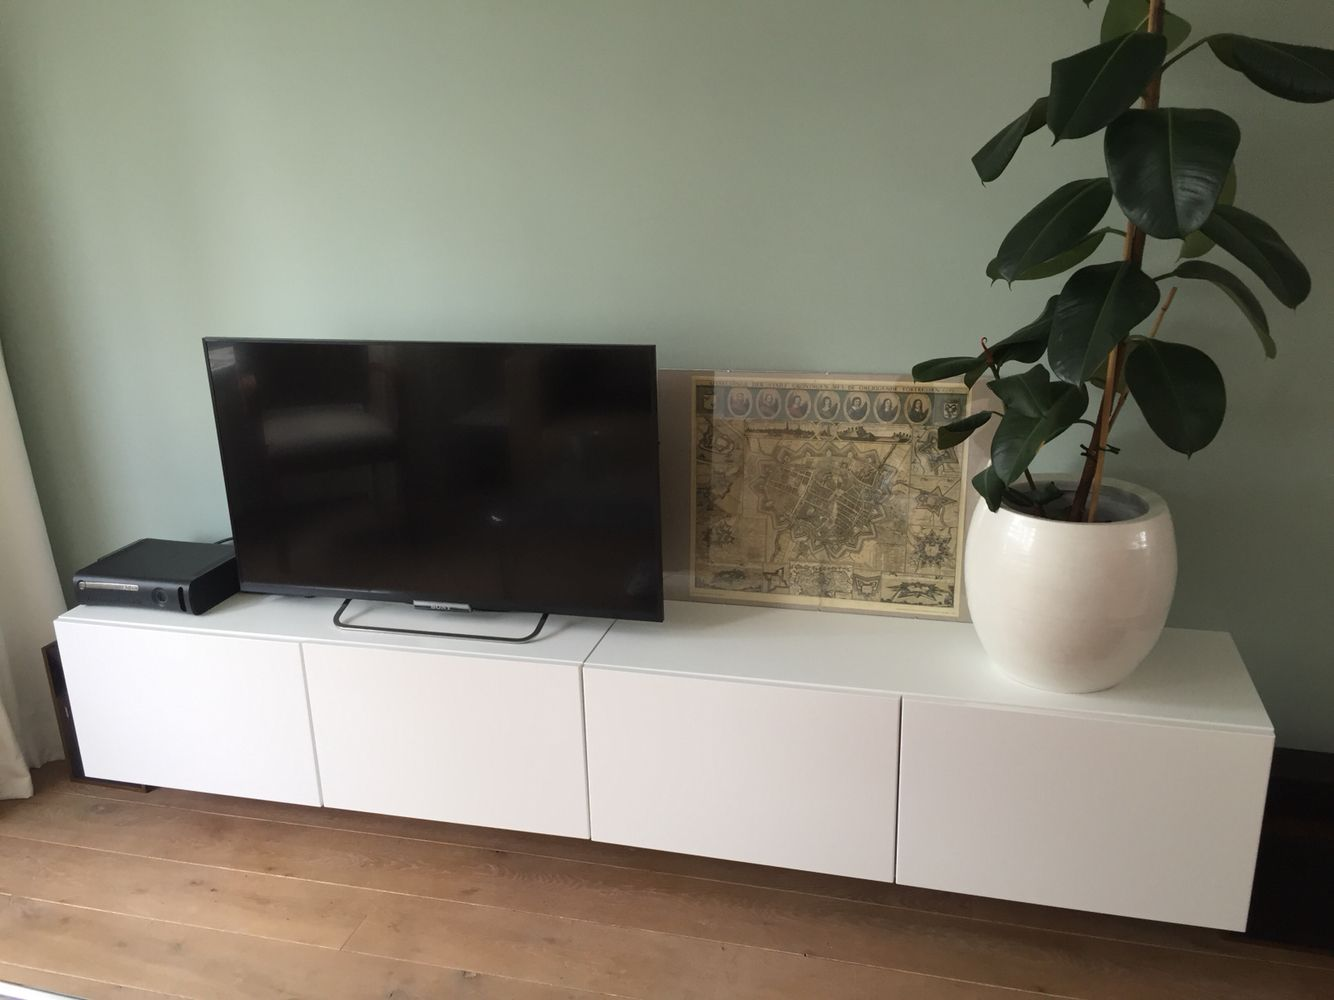 Tv Tafel Ikea : Ikea tv tafel design tv meubel ikea